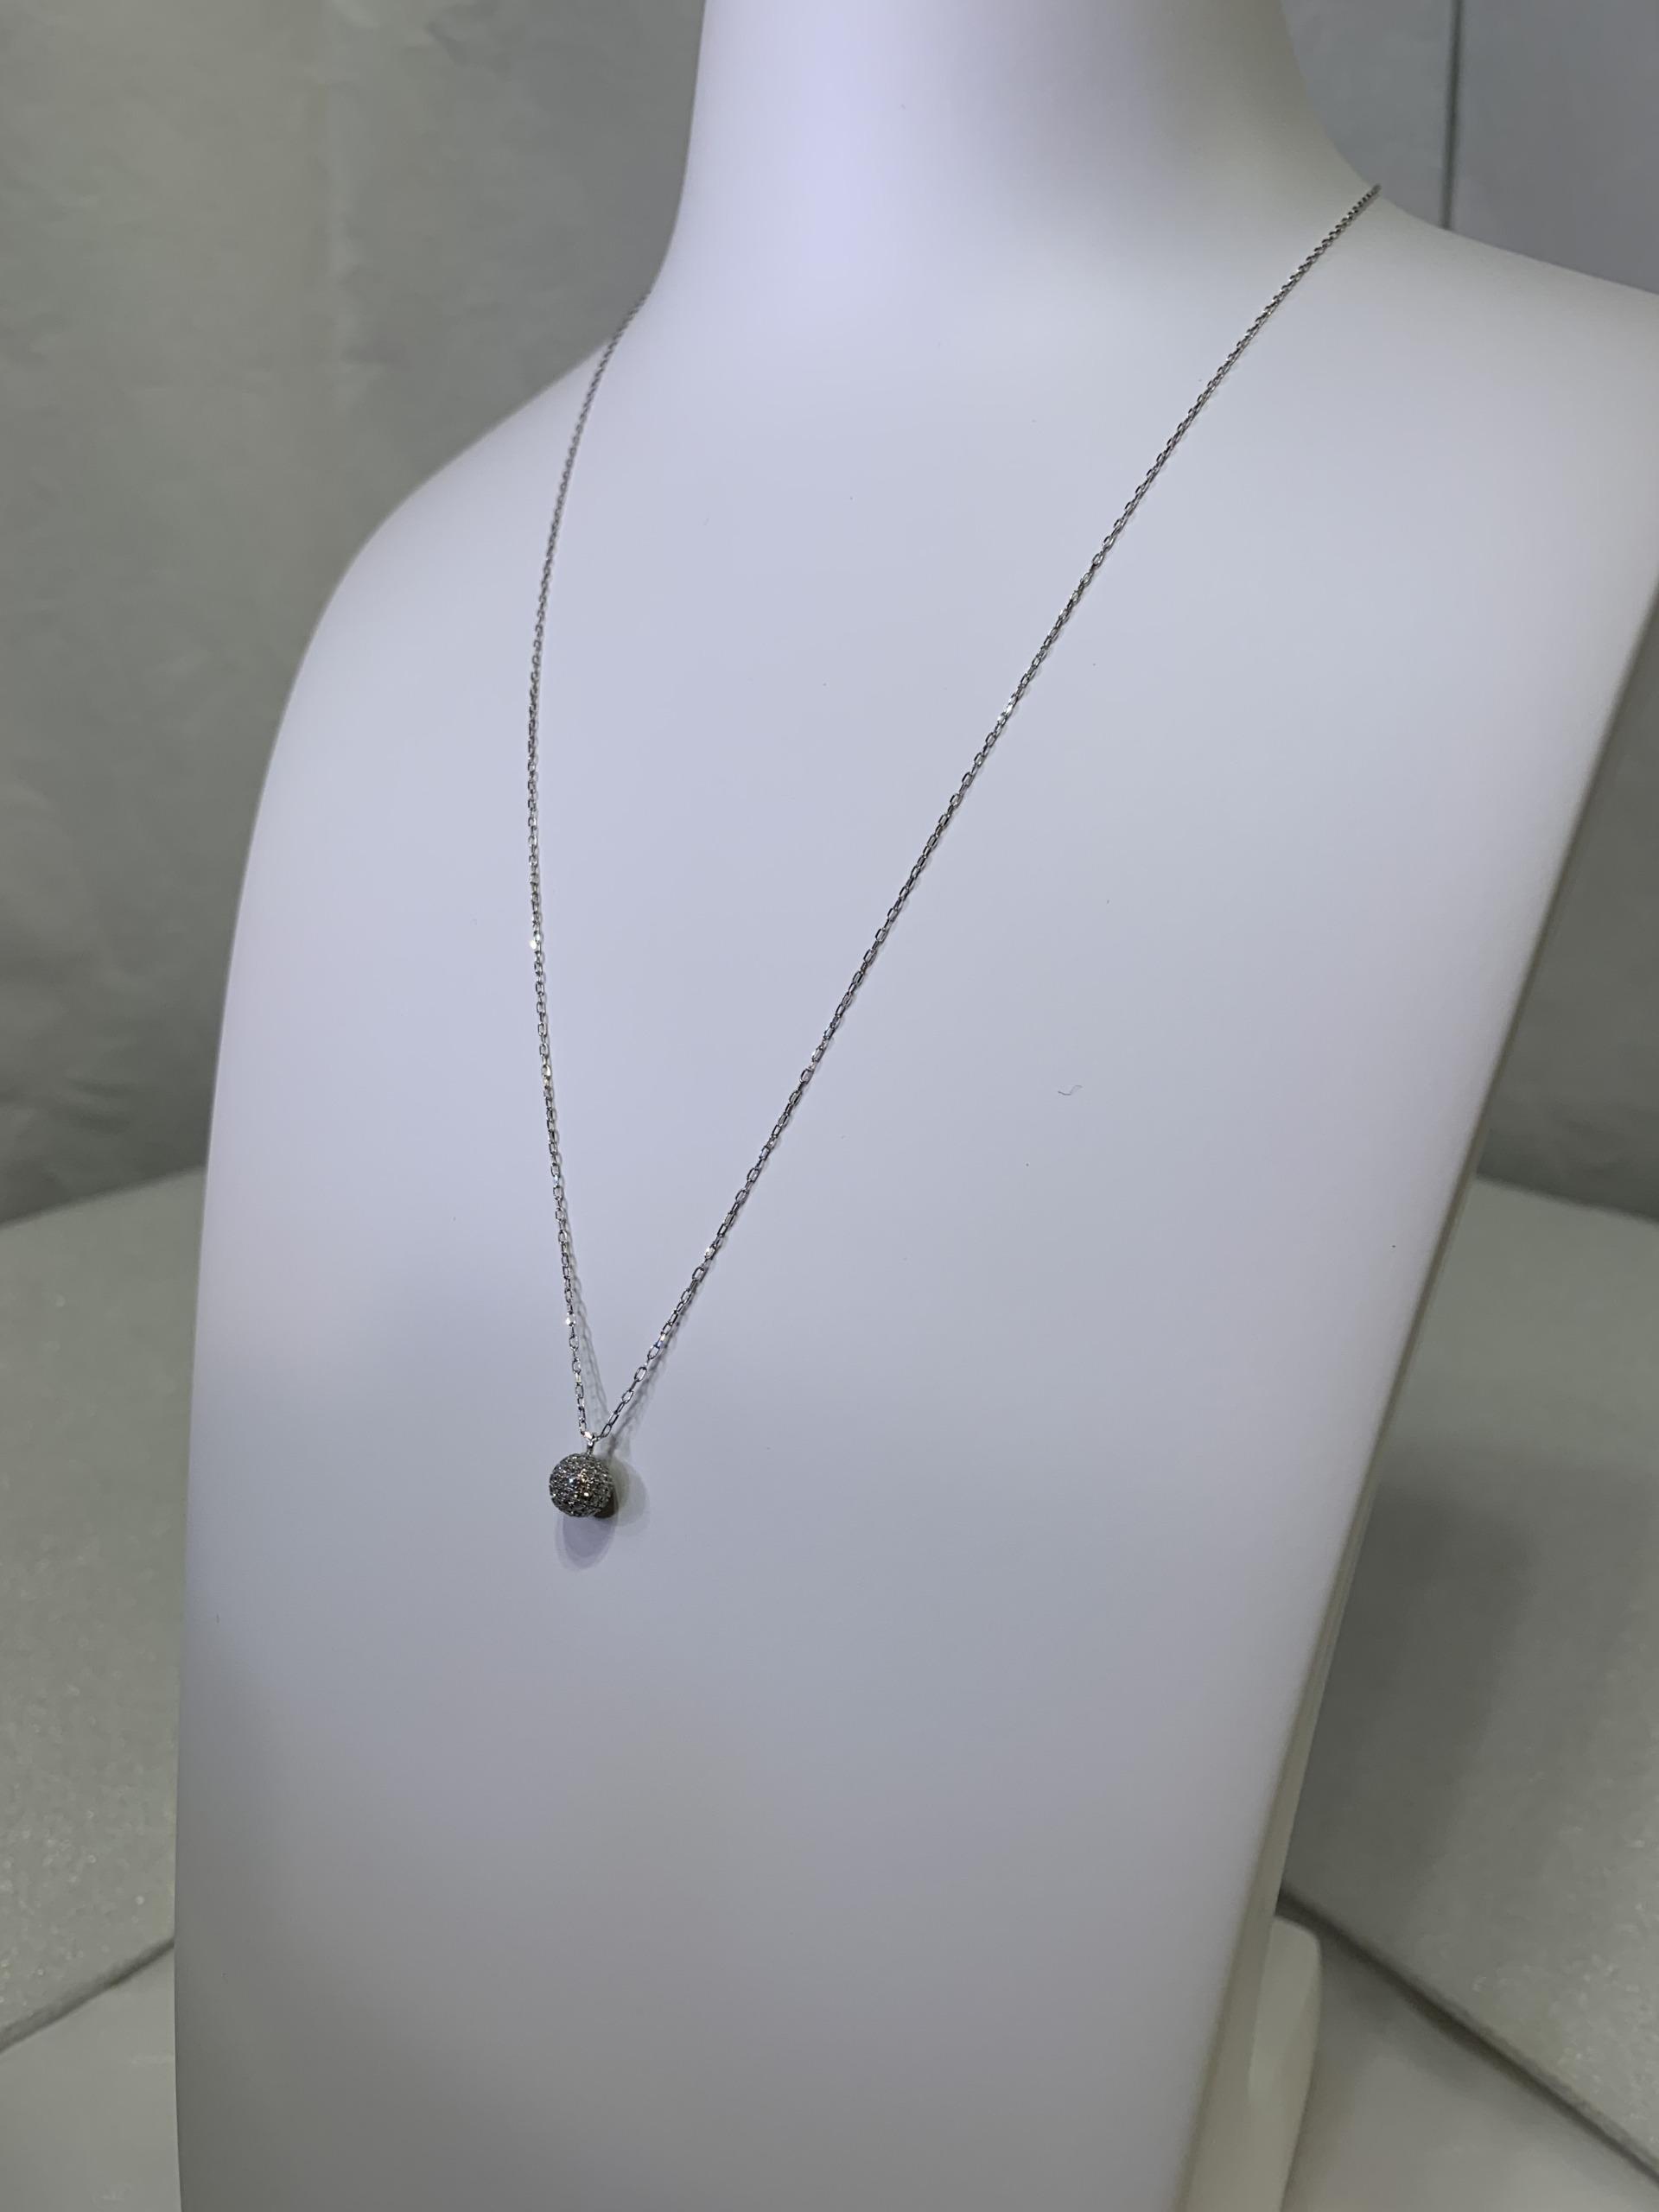 HP-0007 k18WG ダイヤモンドネックレス ダイヤモンド 0.3ct up